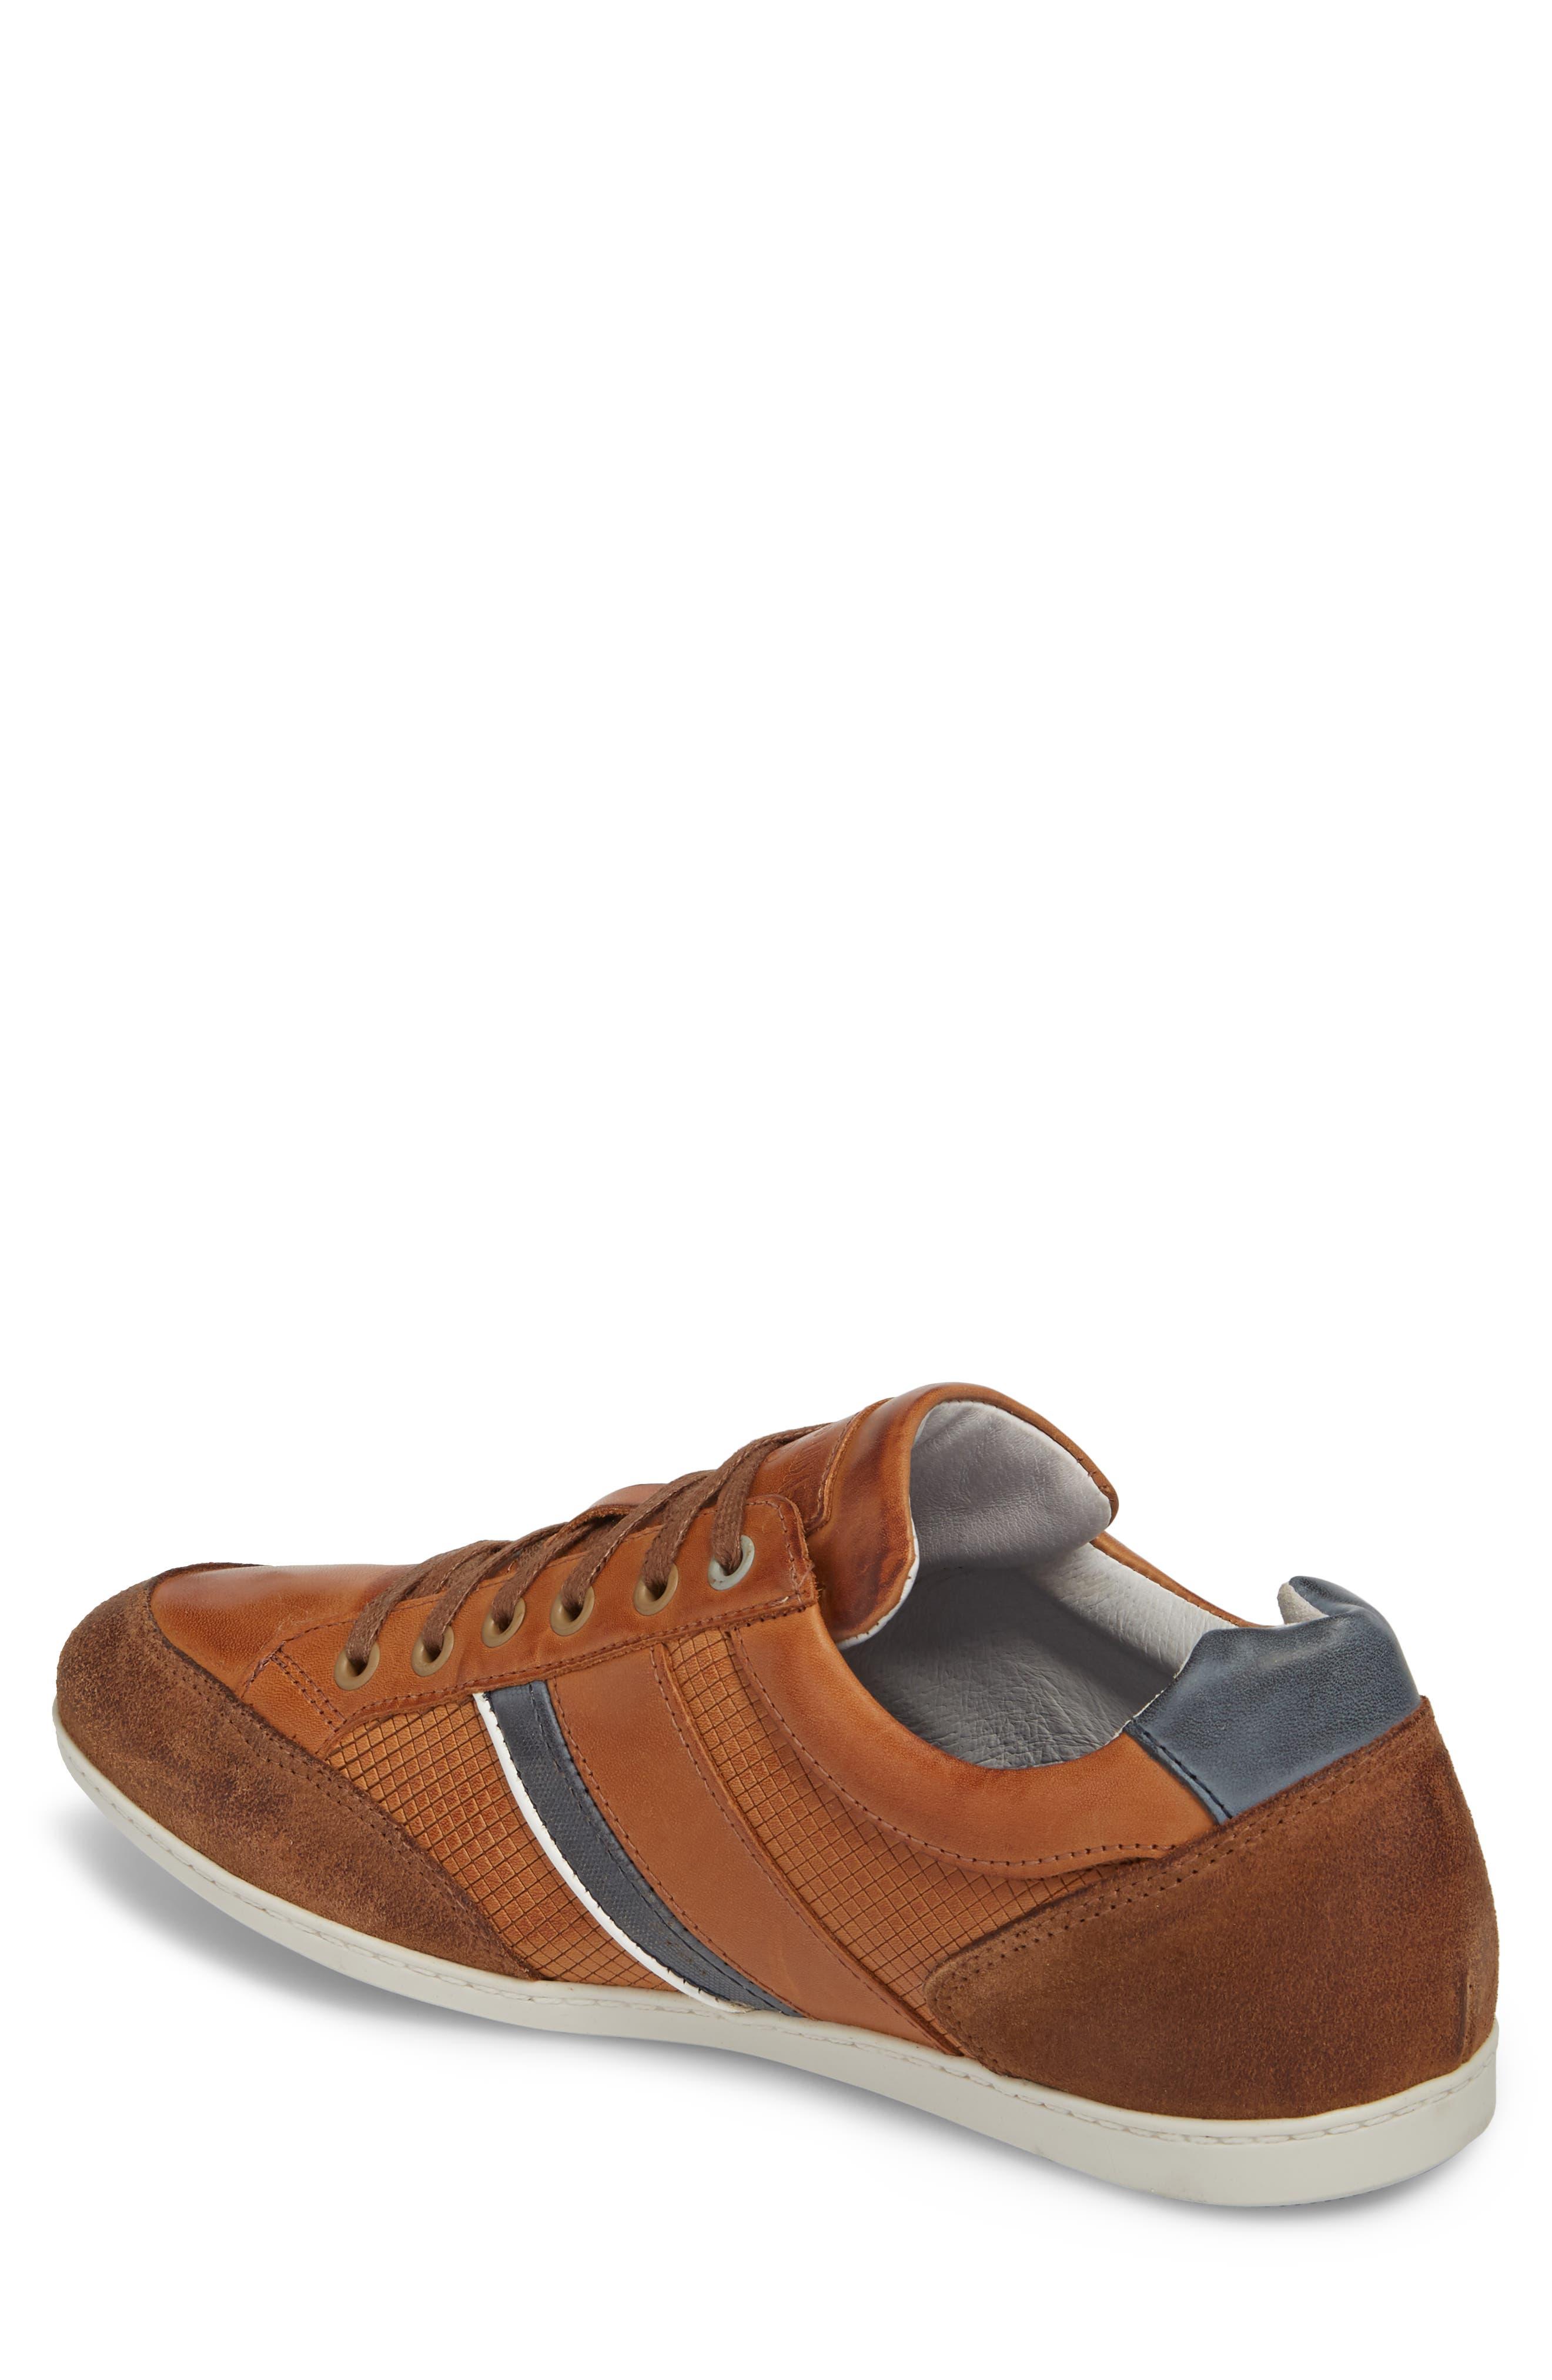 Bahamas Low Top Sneaker,                             Alternate thumbnail 2, color,                             COGNAC LEATHER